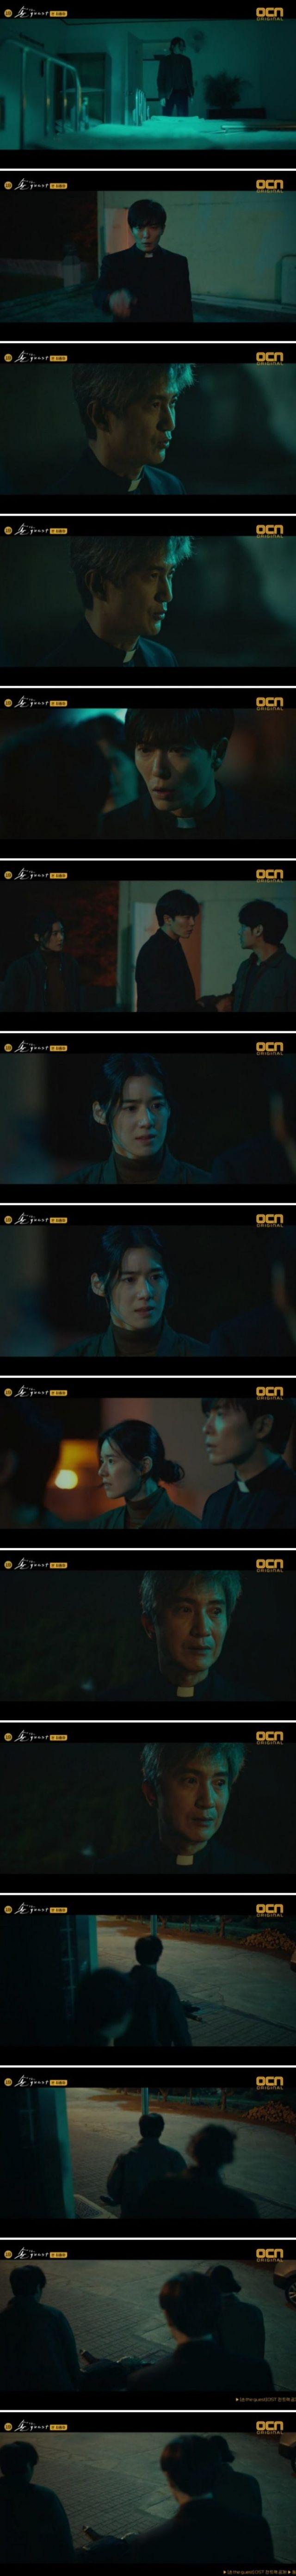 Korean Drama Spoiler] 'The Guest - Drama' Final Episode 16